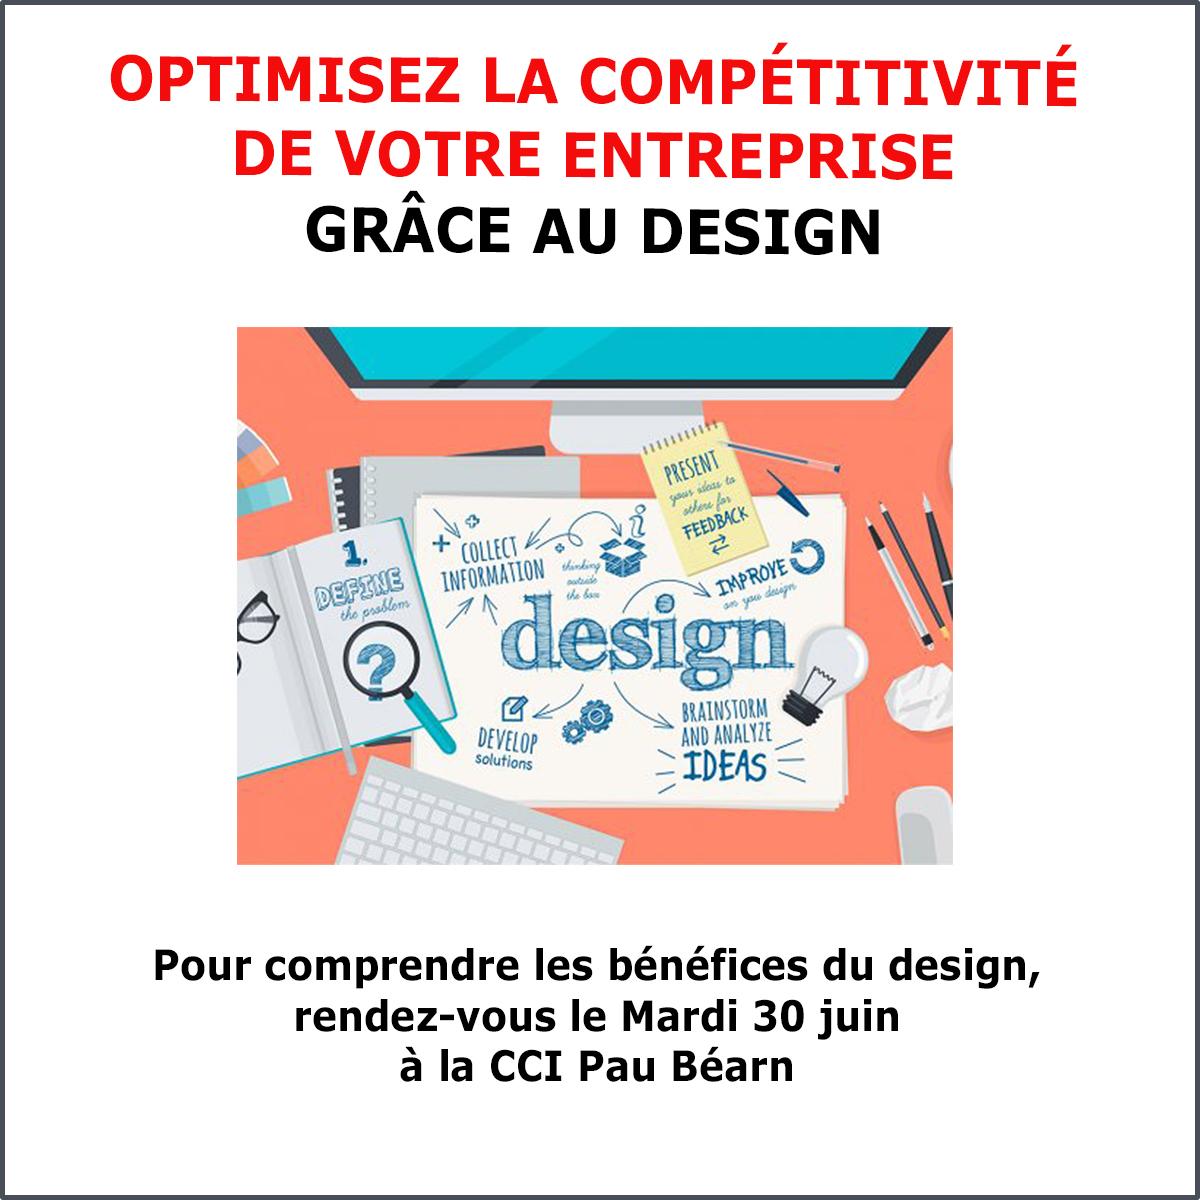 design_entreprise_juin2015